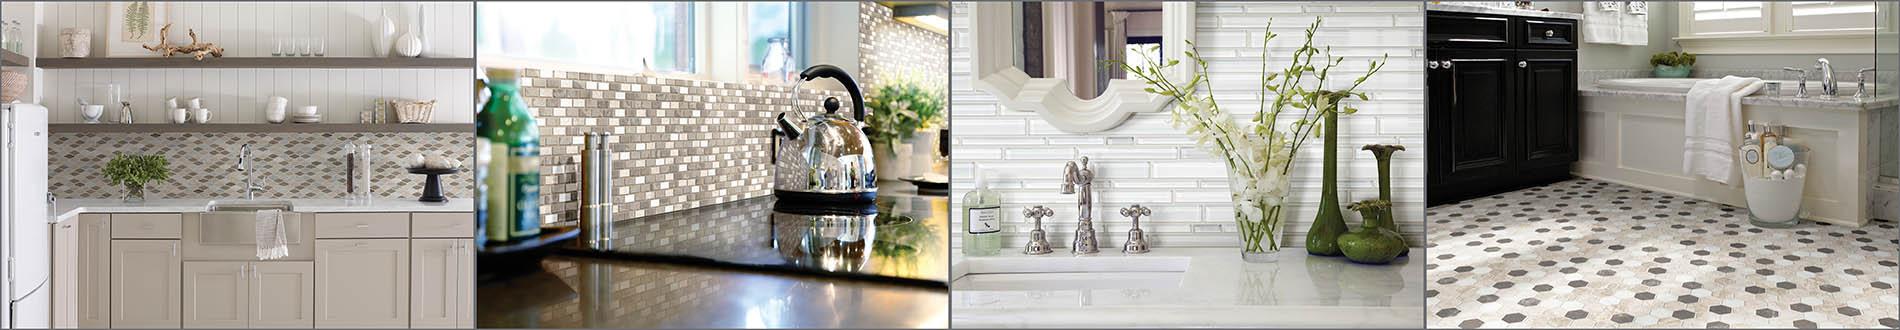 Seland's local top-notch tile craftsmen will install your dream shower or backsplash.